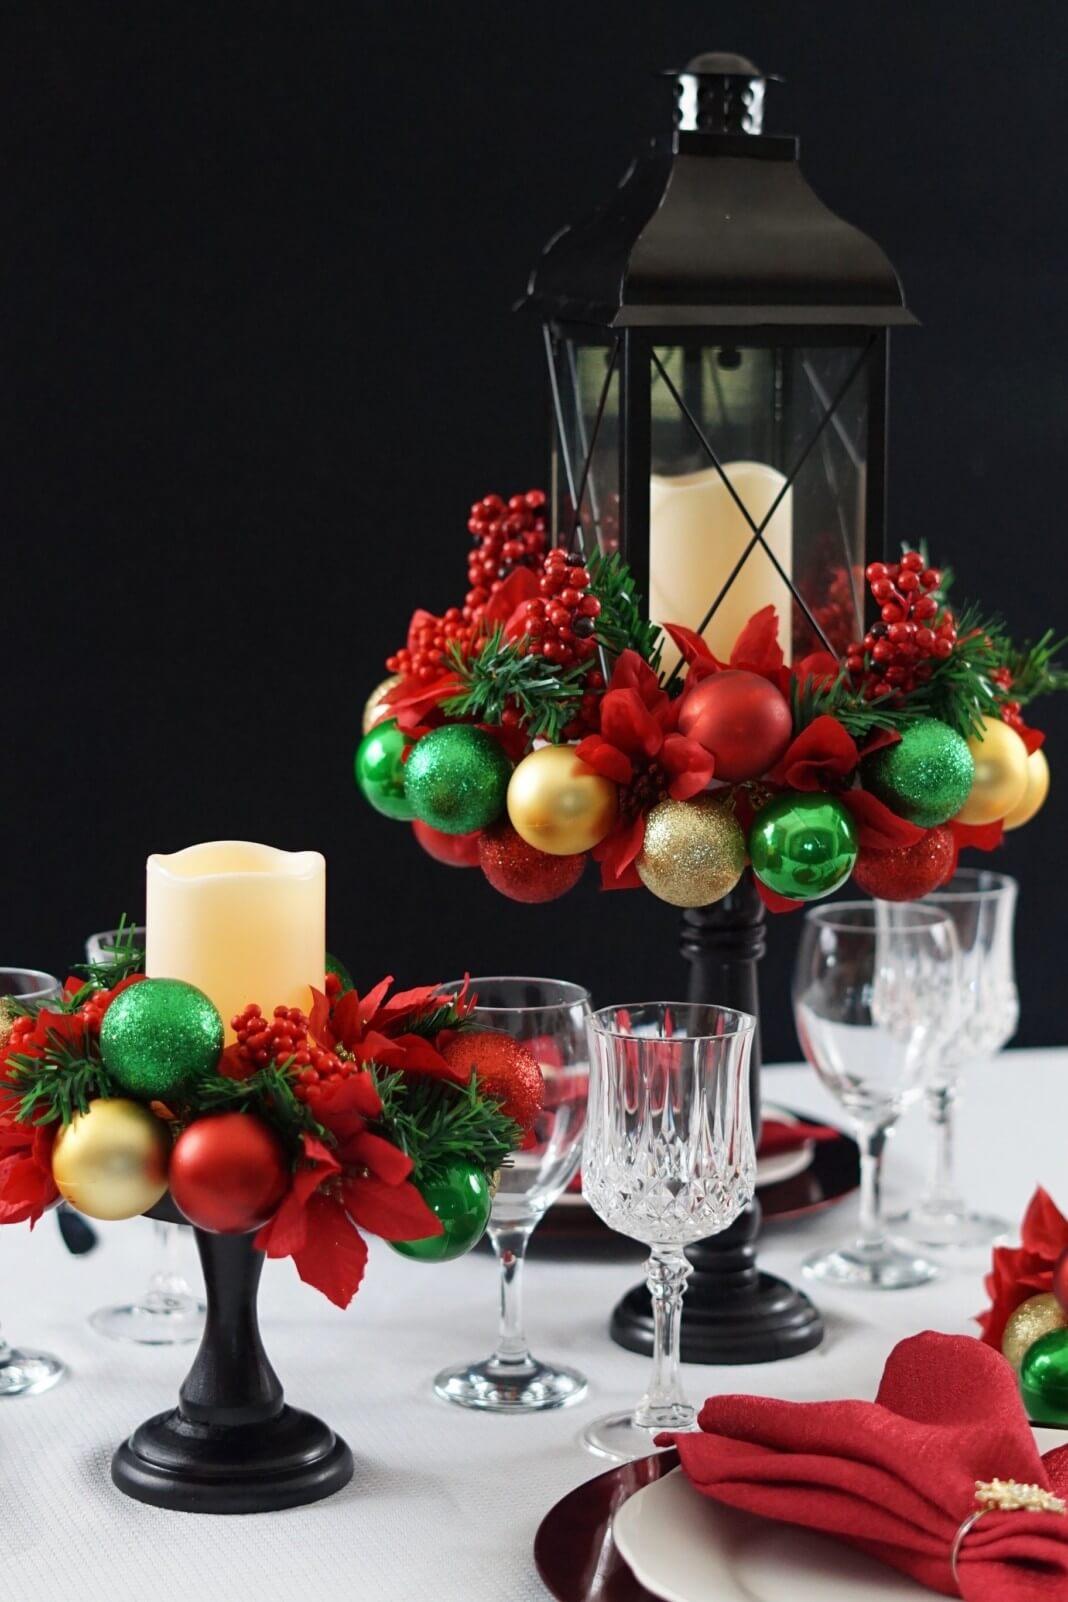 Raised Lantern and Christmas Ornament Centerpiece